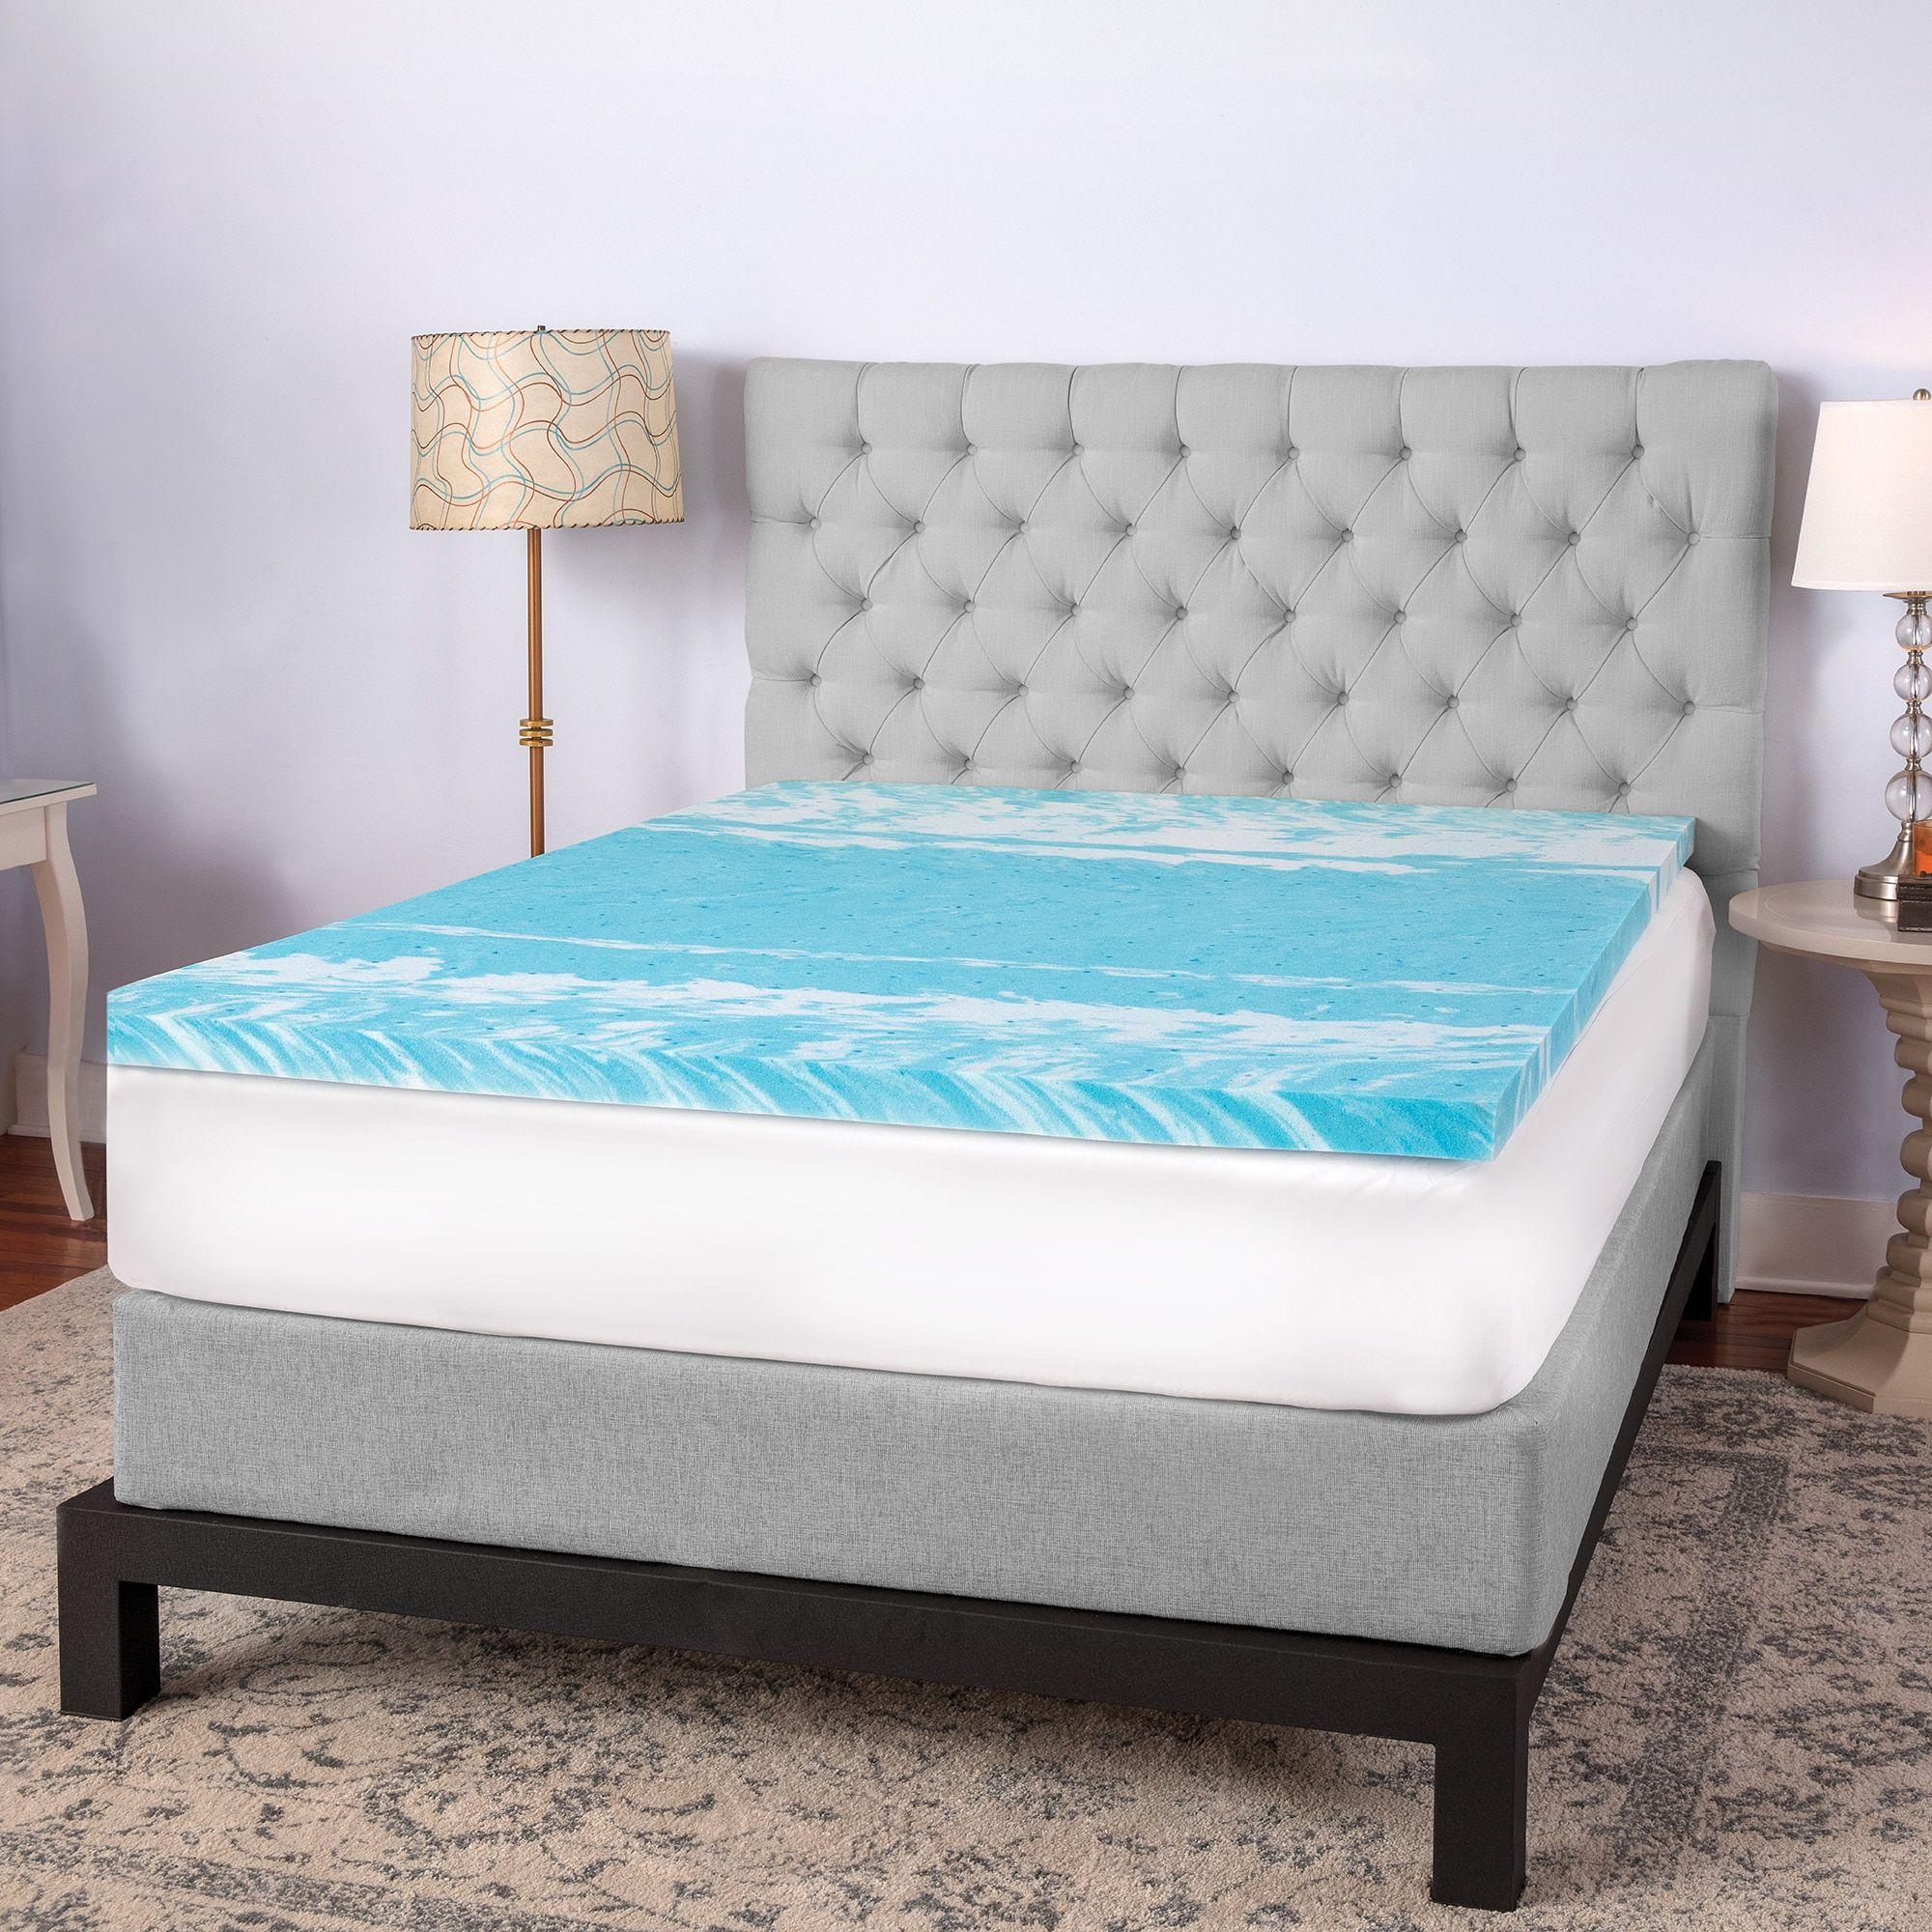 foam topper silica memory walmart gel ip mattress com king